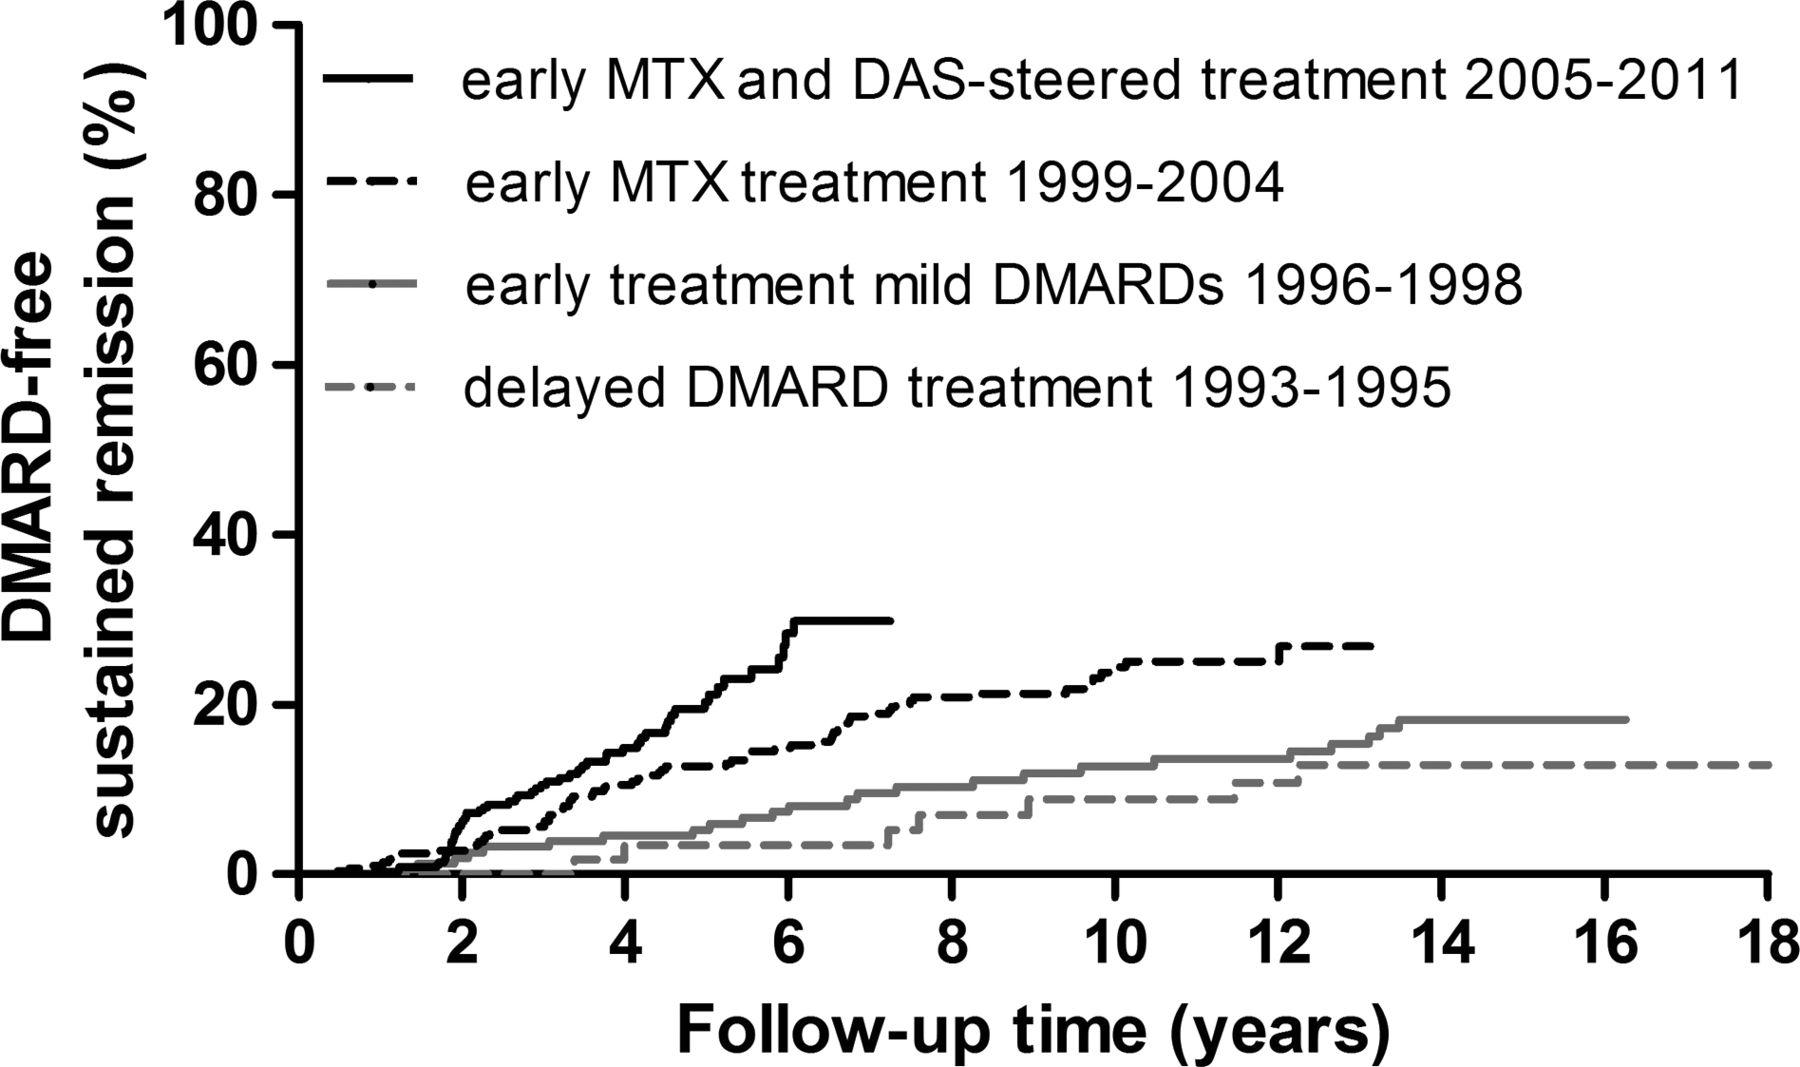 disease-modifying antirheumatic drug-free sustained remission in